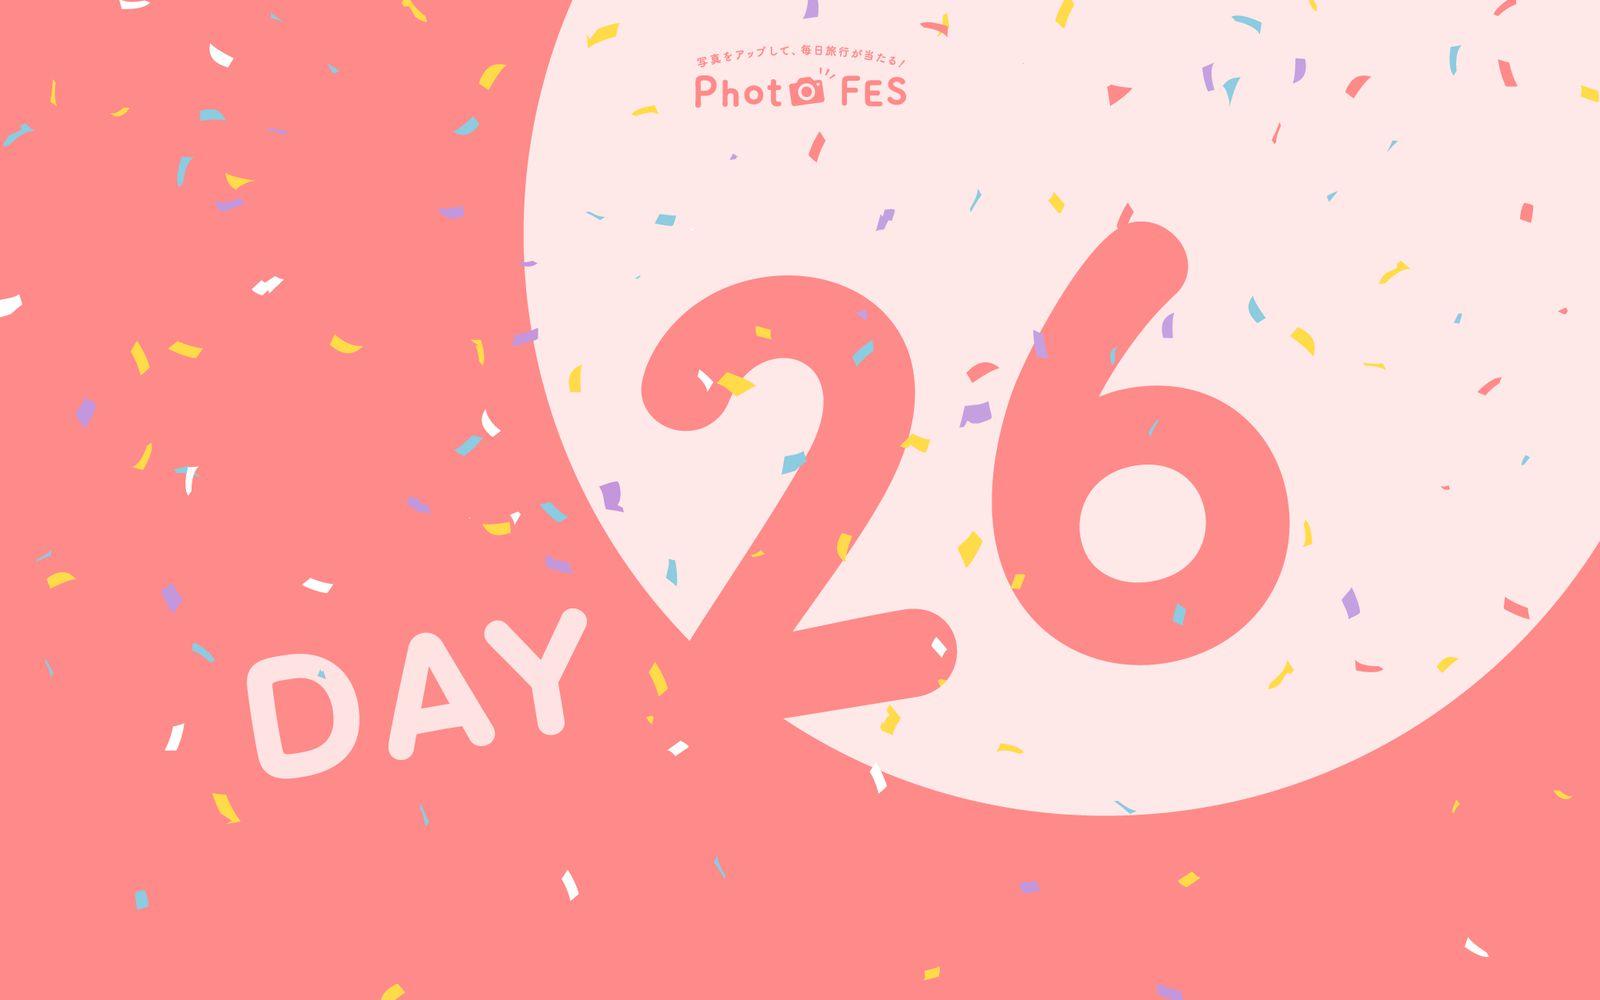 【DAY26】「Photo FES Summer シーズン2」9月11日投稿分であたる賞品&受賞者発表